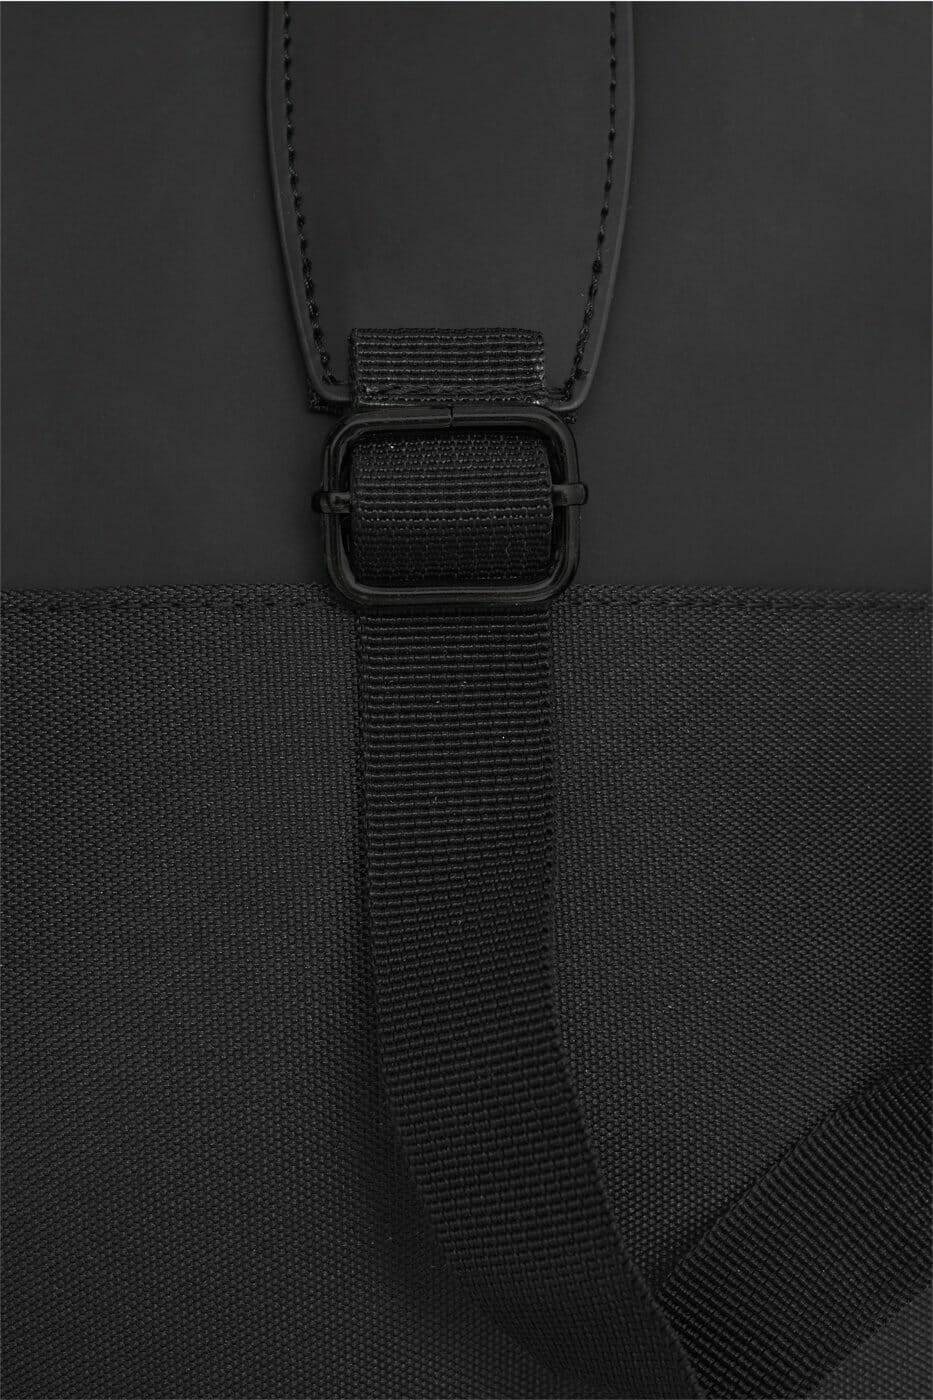 City_Backpack-Bags-1292-01_Black_1400x1400